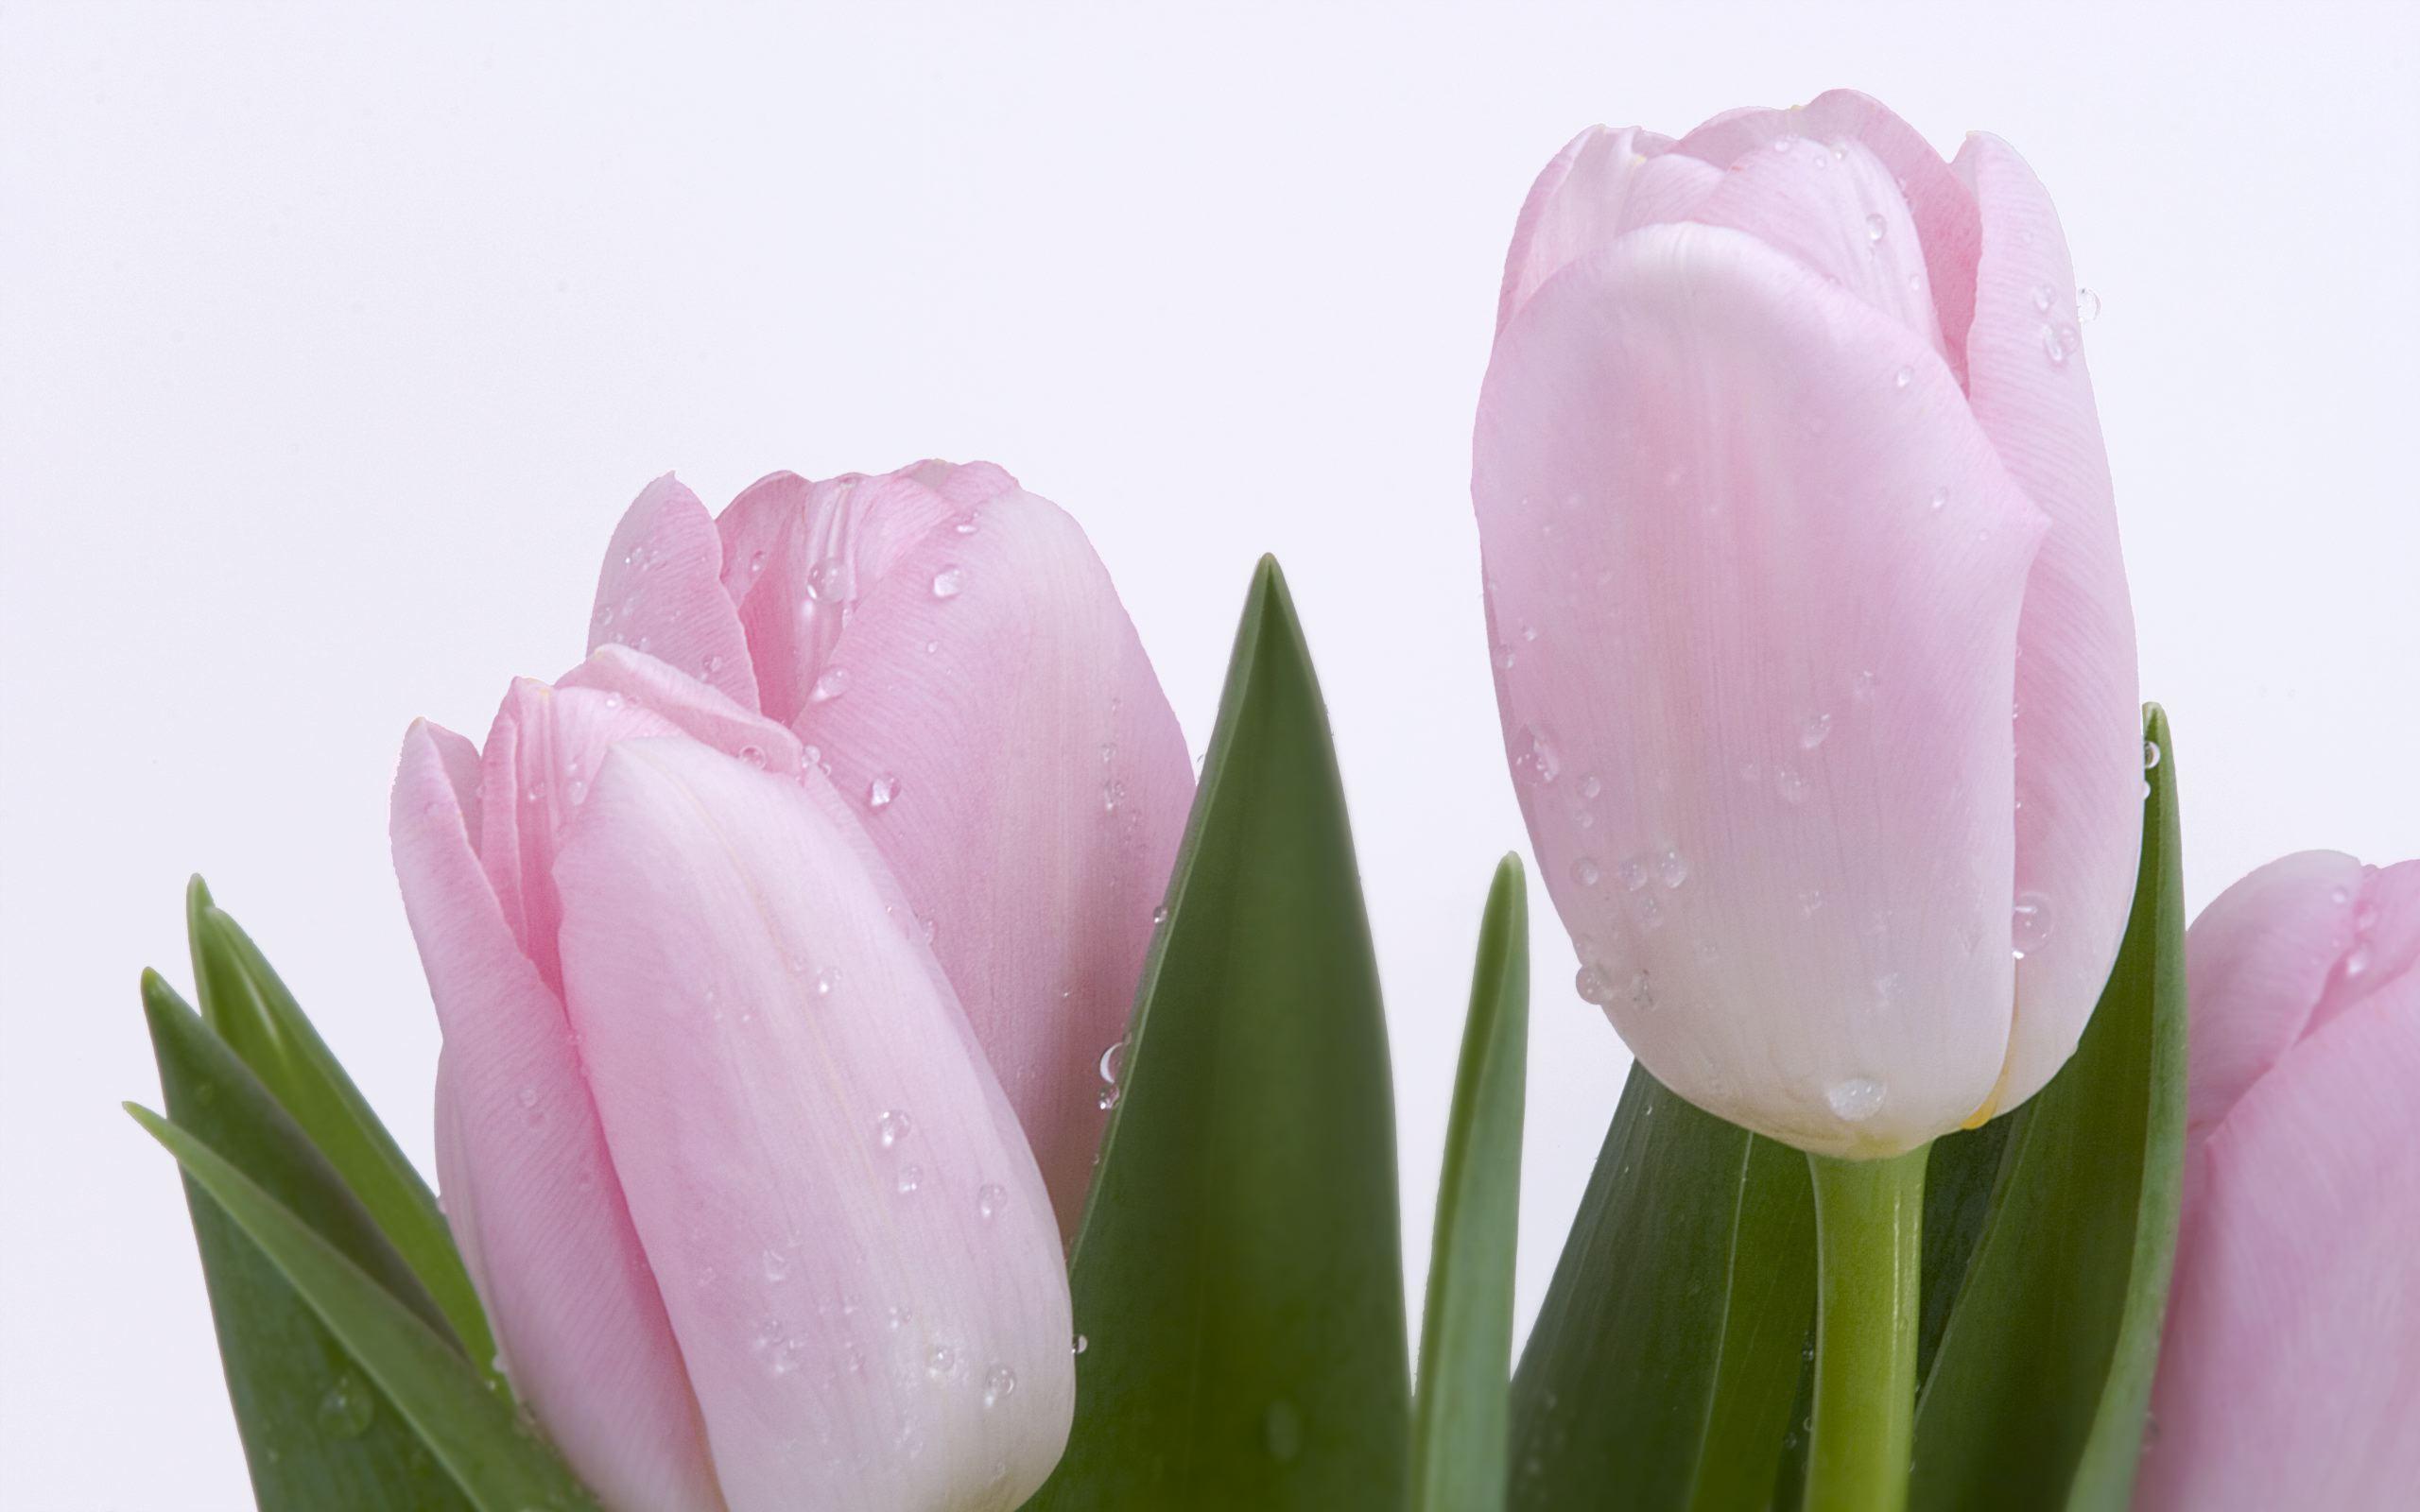 Tulip hd wallpaper background image 2560x1600 id101914 wallpapers id101914 izmirmasajfo